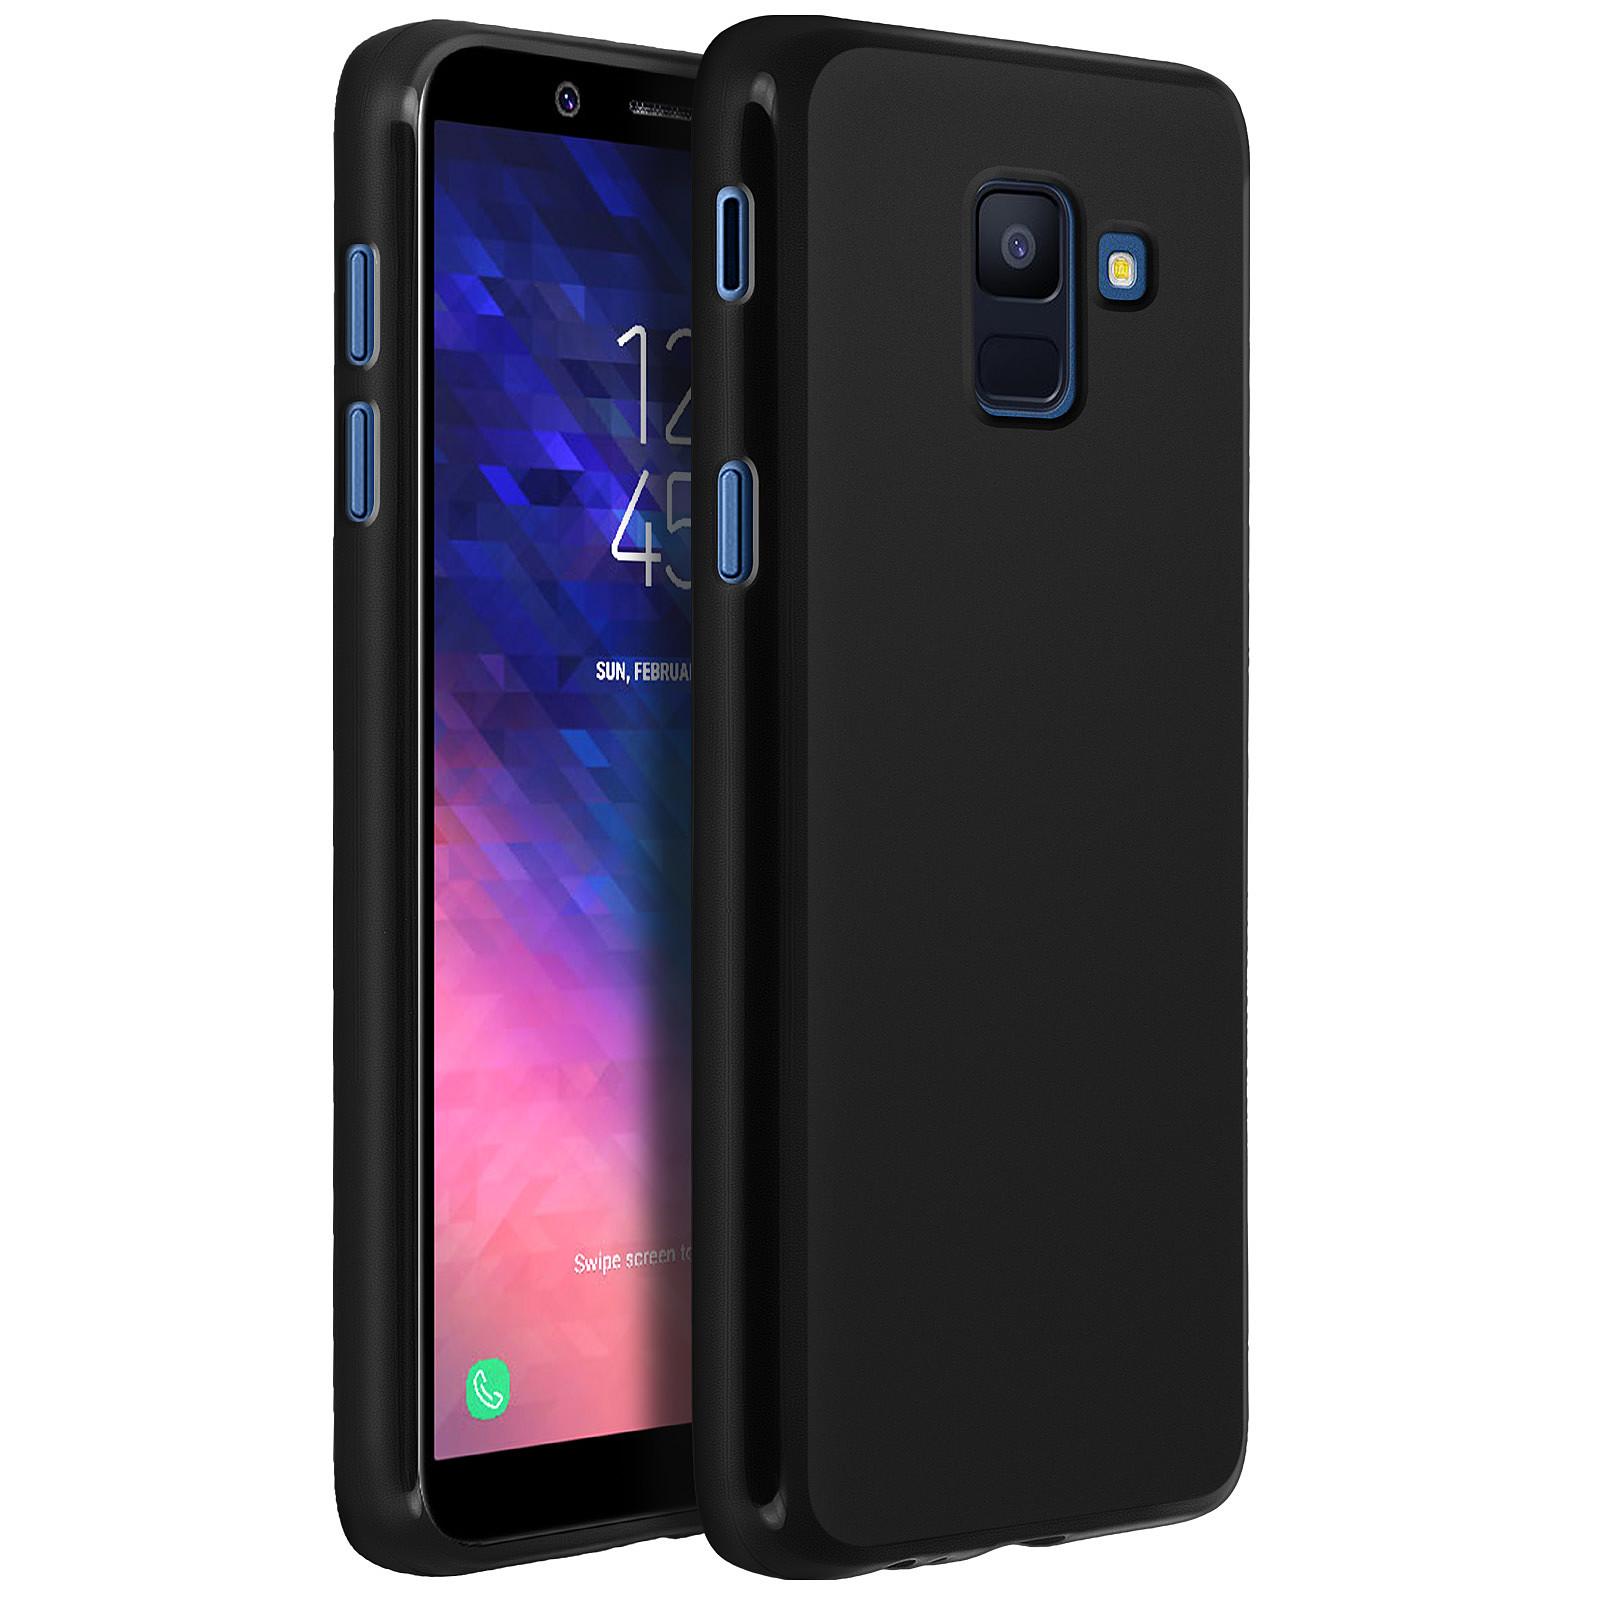 Avizar Coque Noir pour Samsung Galaxy J6